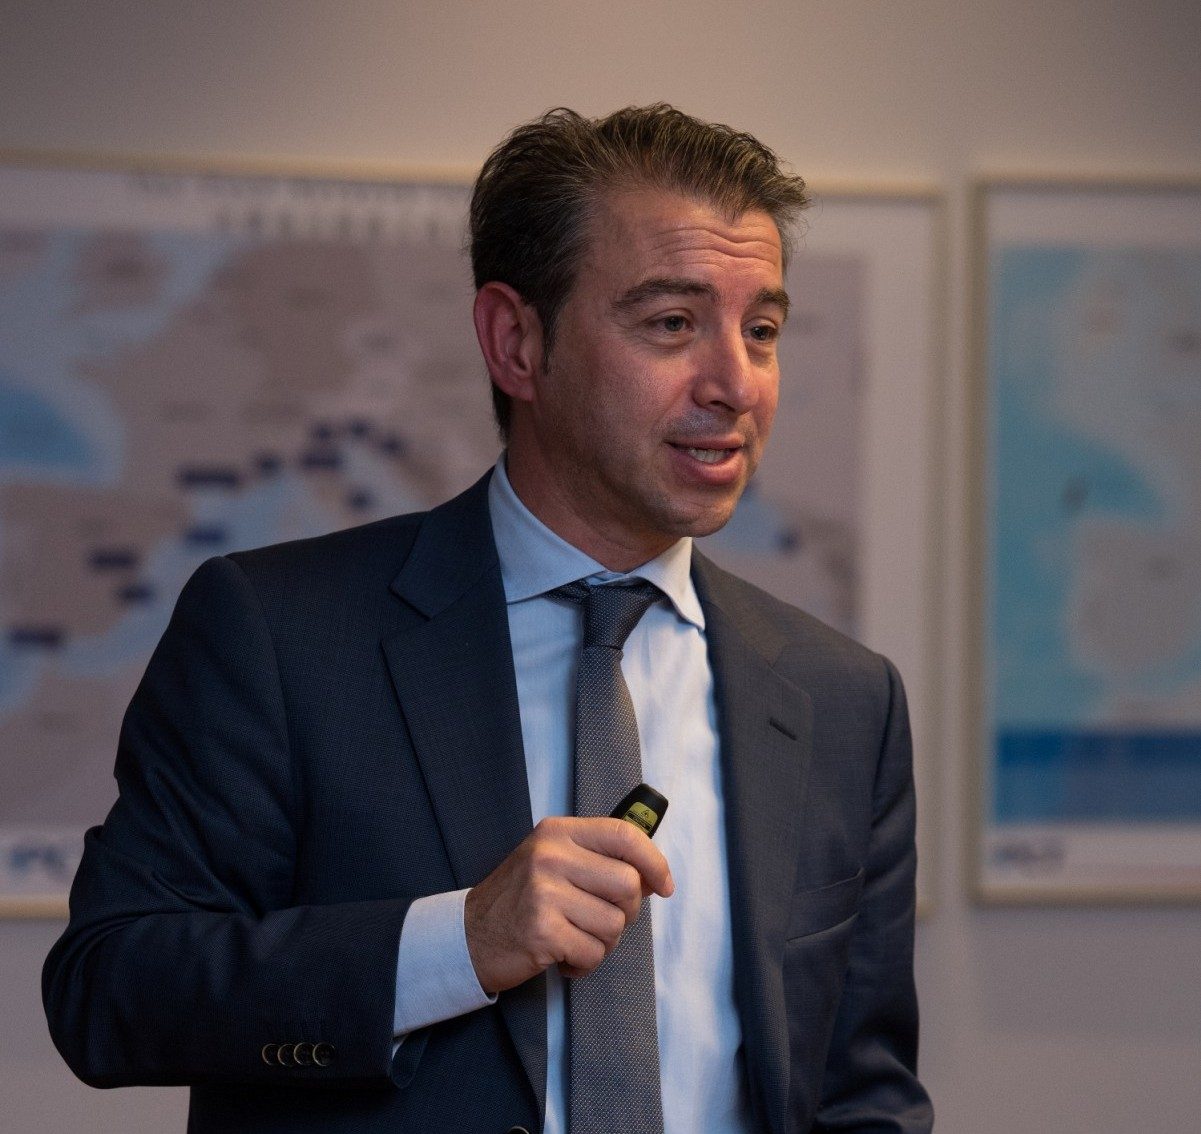 O κ. Ηλίας Χατζηεφραιμίδης, Πρόεδρος της WIMA, κατά τη διάρκεια της παρουσίασης